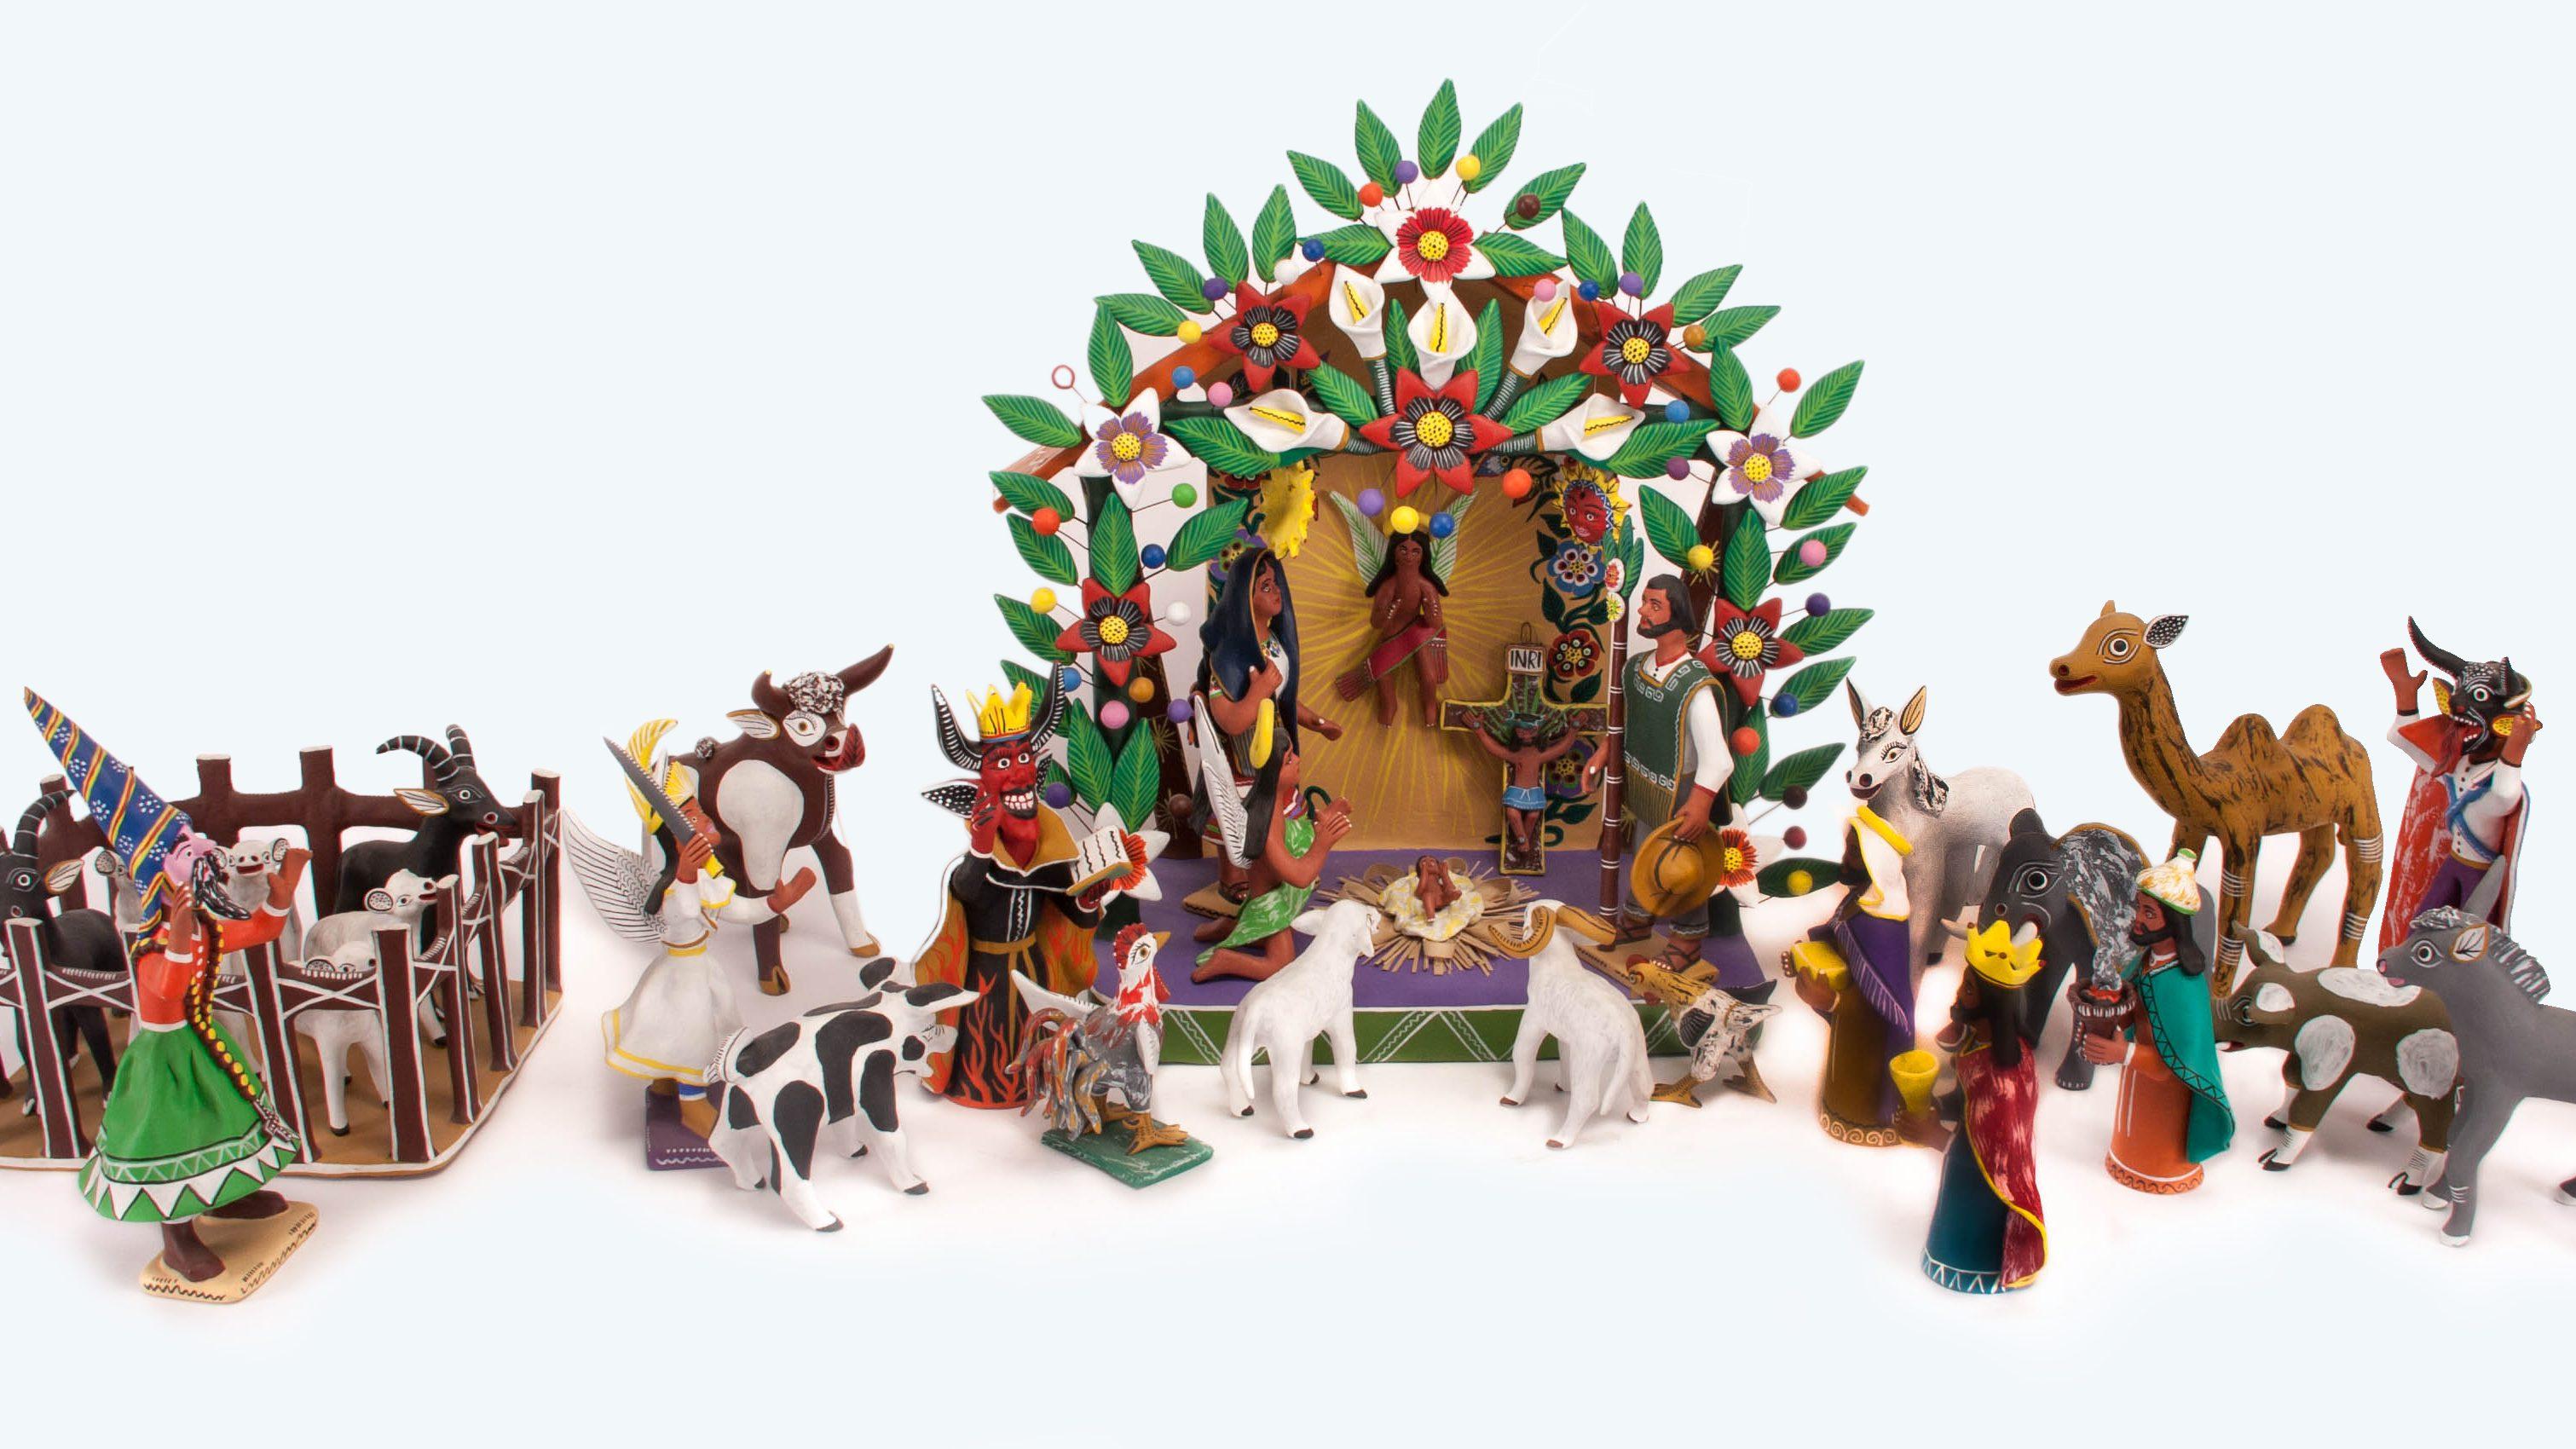 Artisanal Mexican Nativity Scene